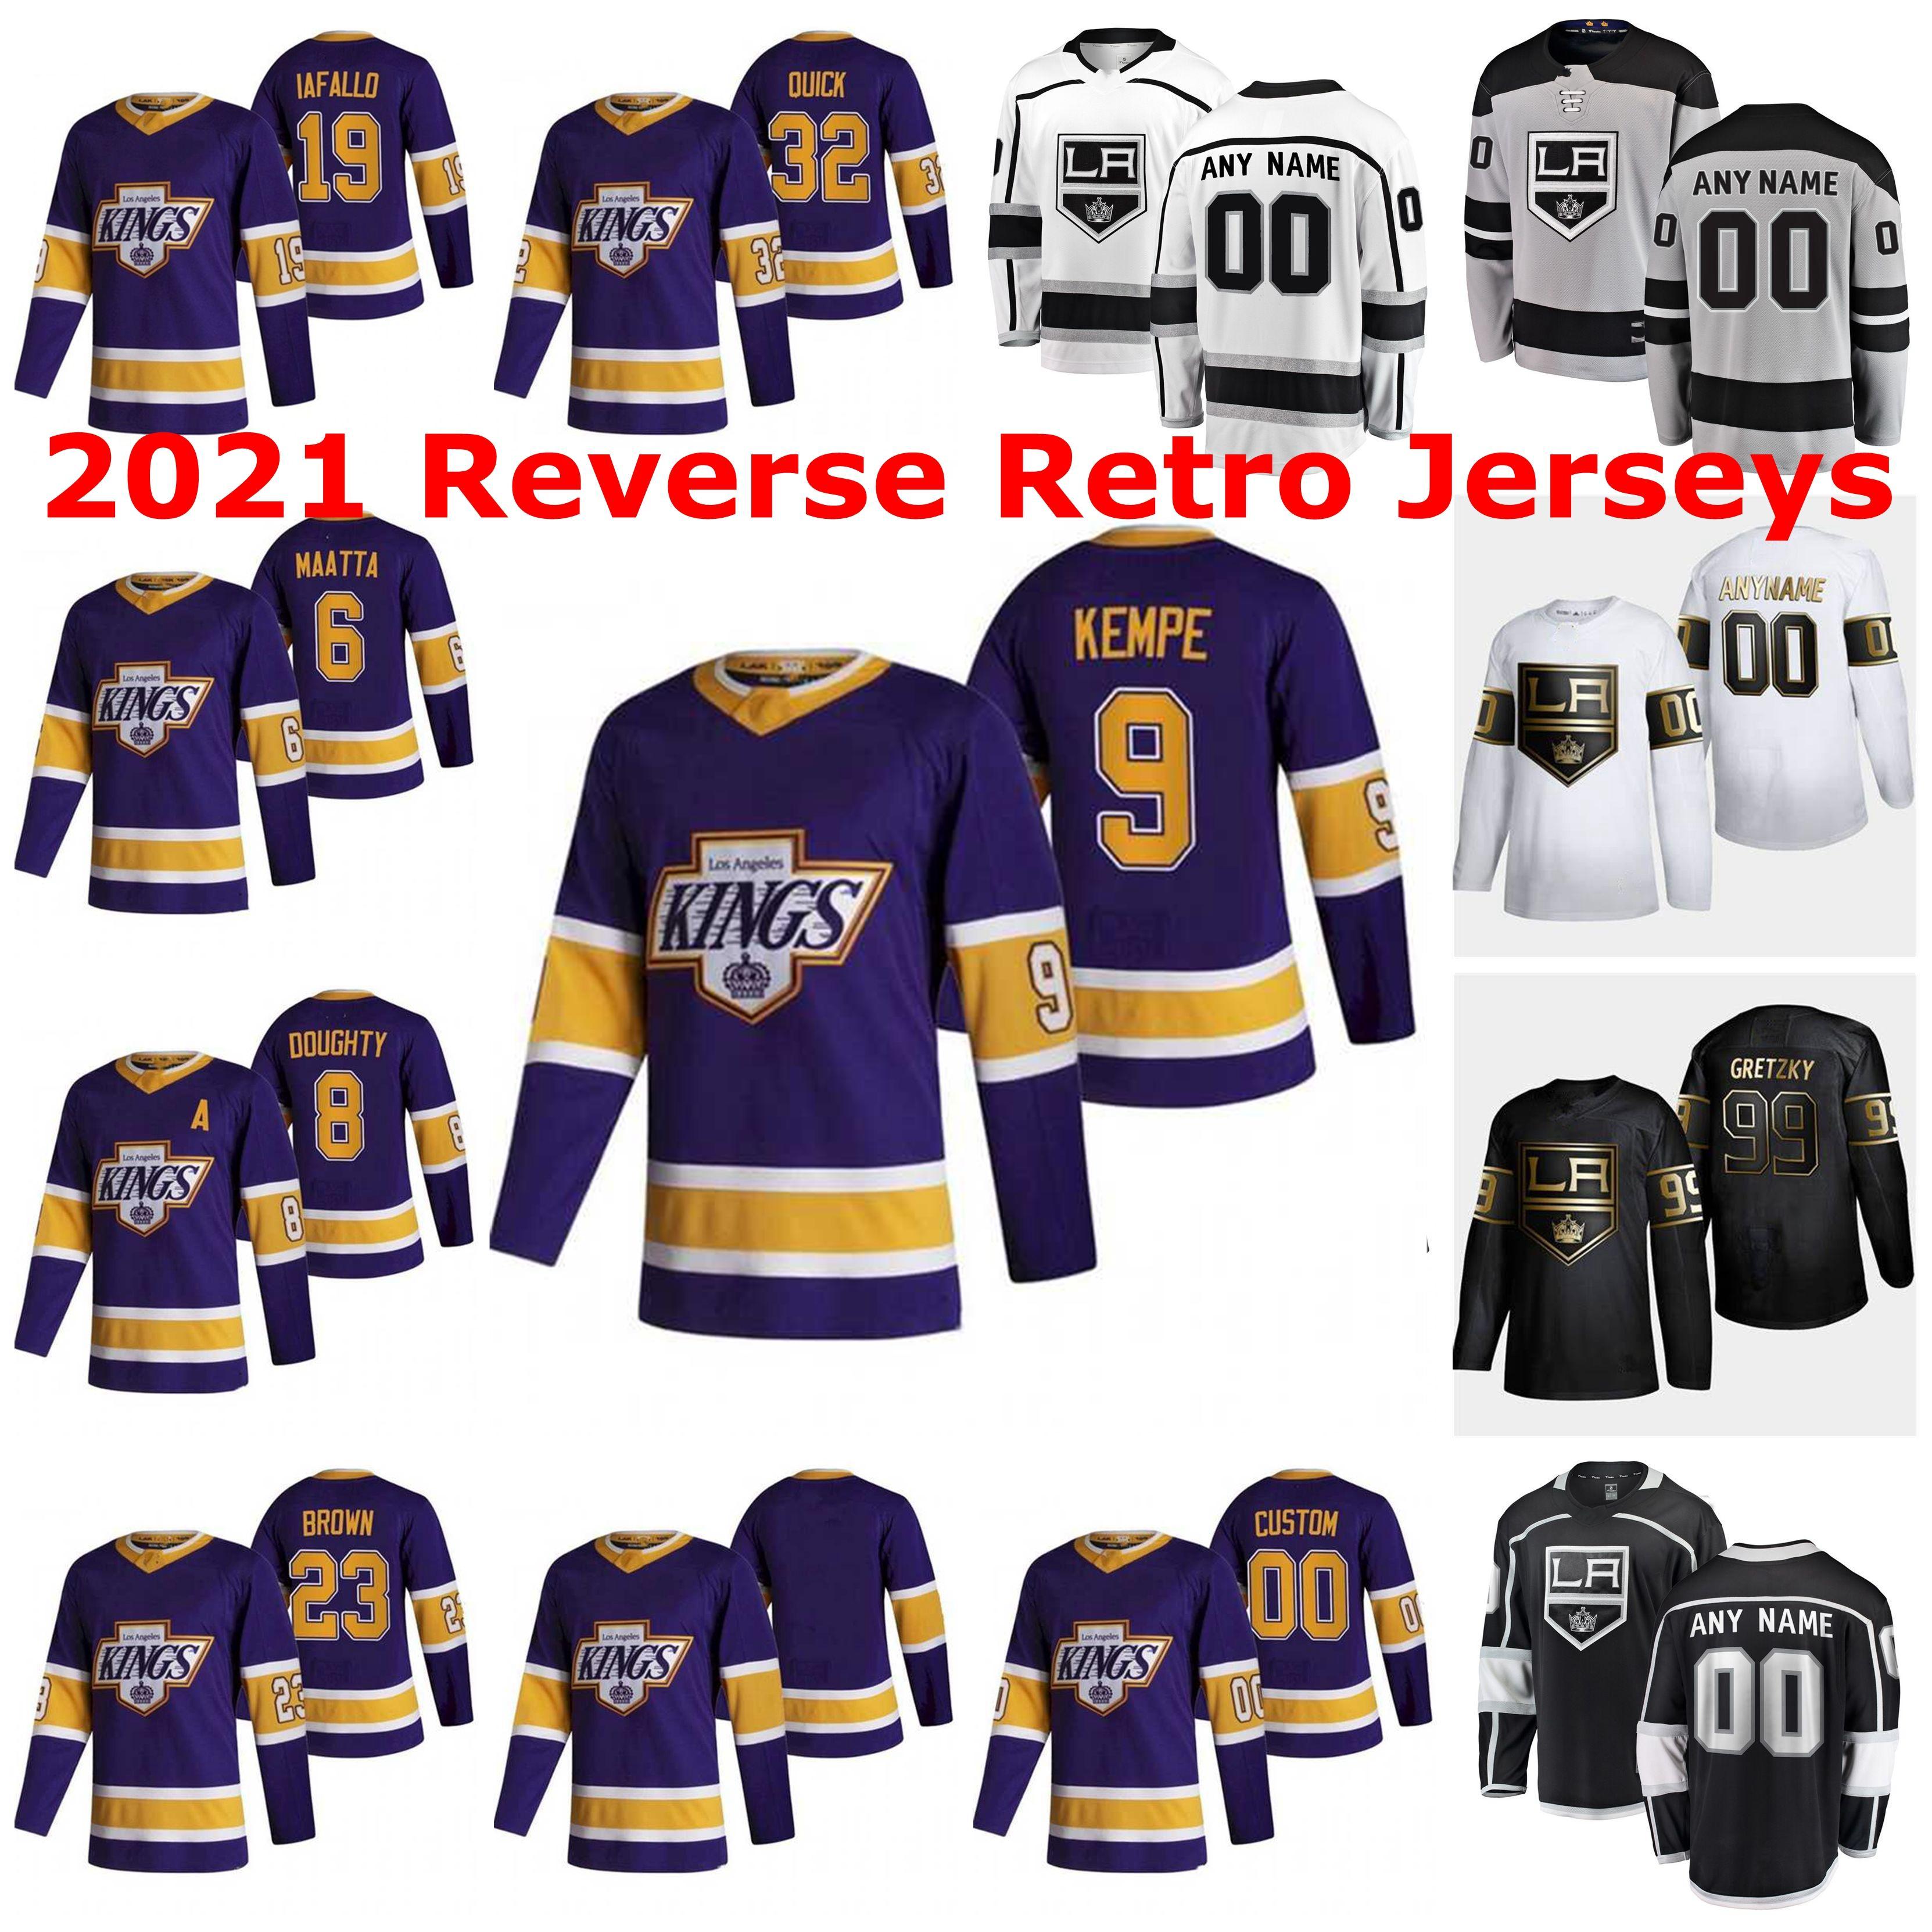 Los Angeles Kings 2021 Reverse Retro Jerseys Drew Doughty Jersey Michael Amadio Jeff Carter Kyle Clifford Alex Iafallo Custom Stitched